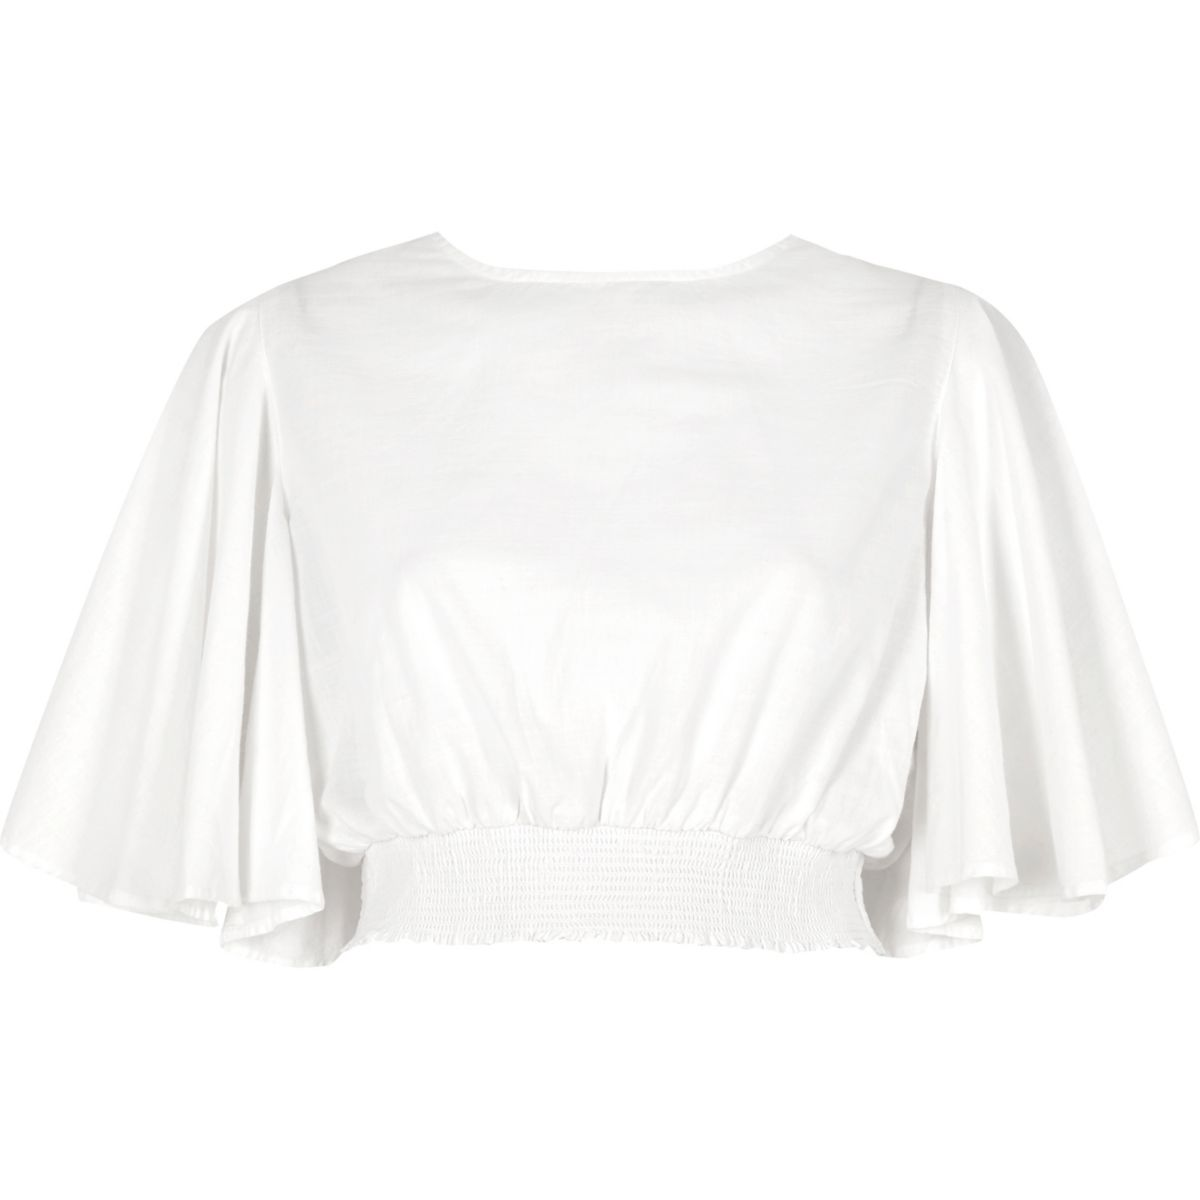 White flared sleeve crop top